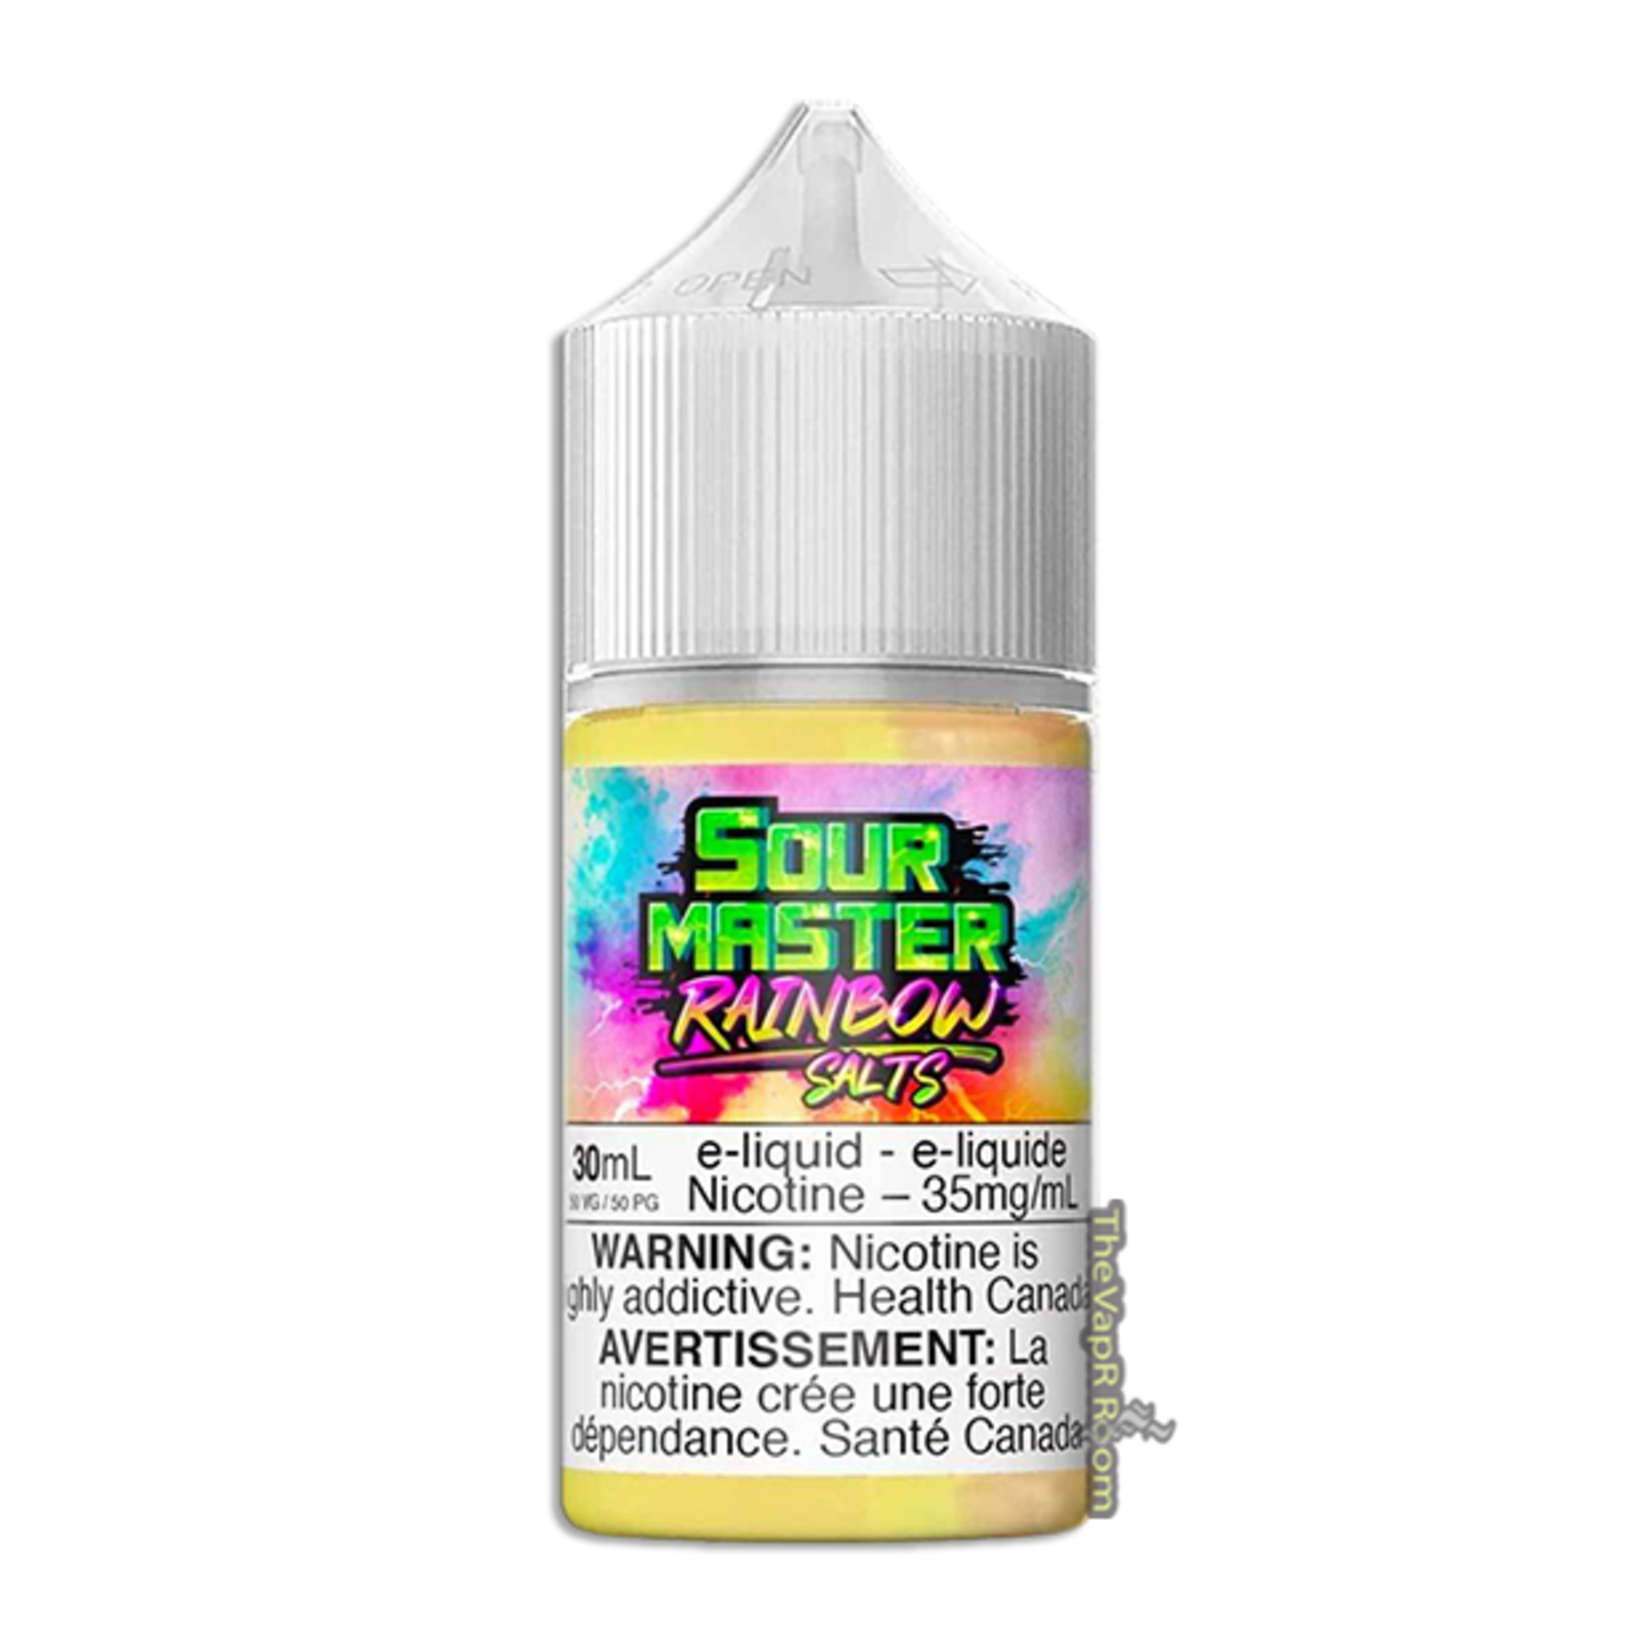 Solar Master Rainbow Salt